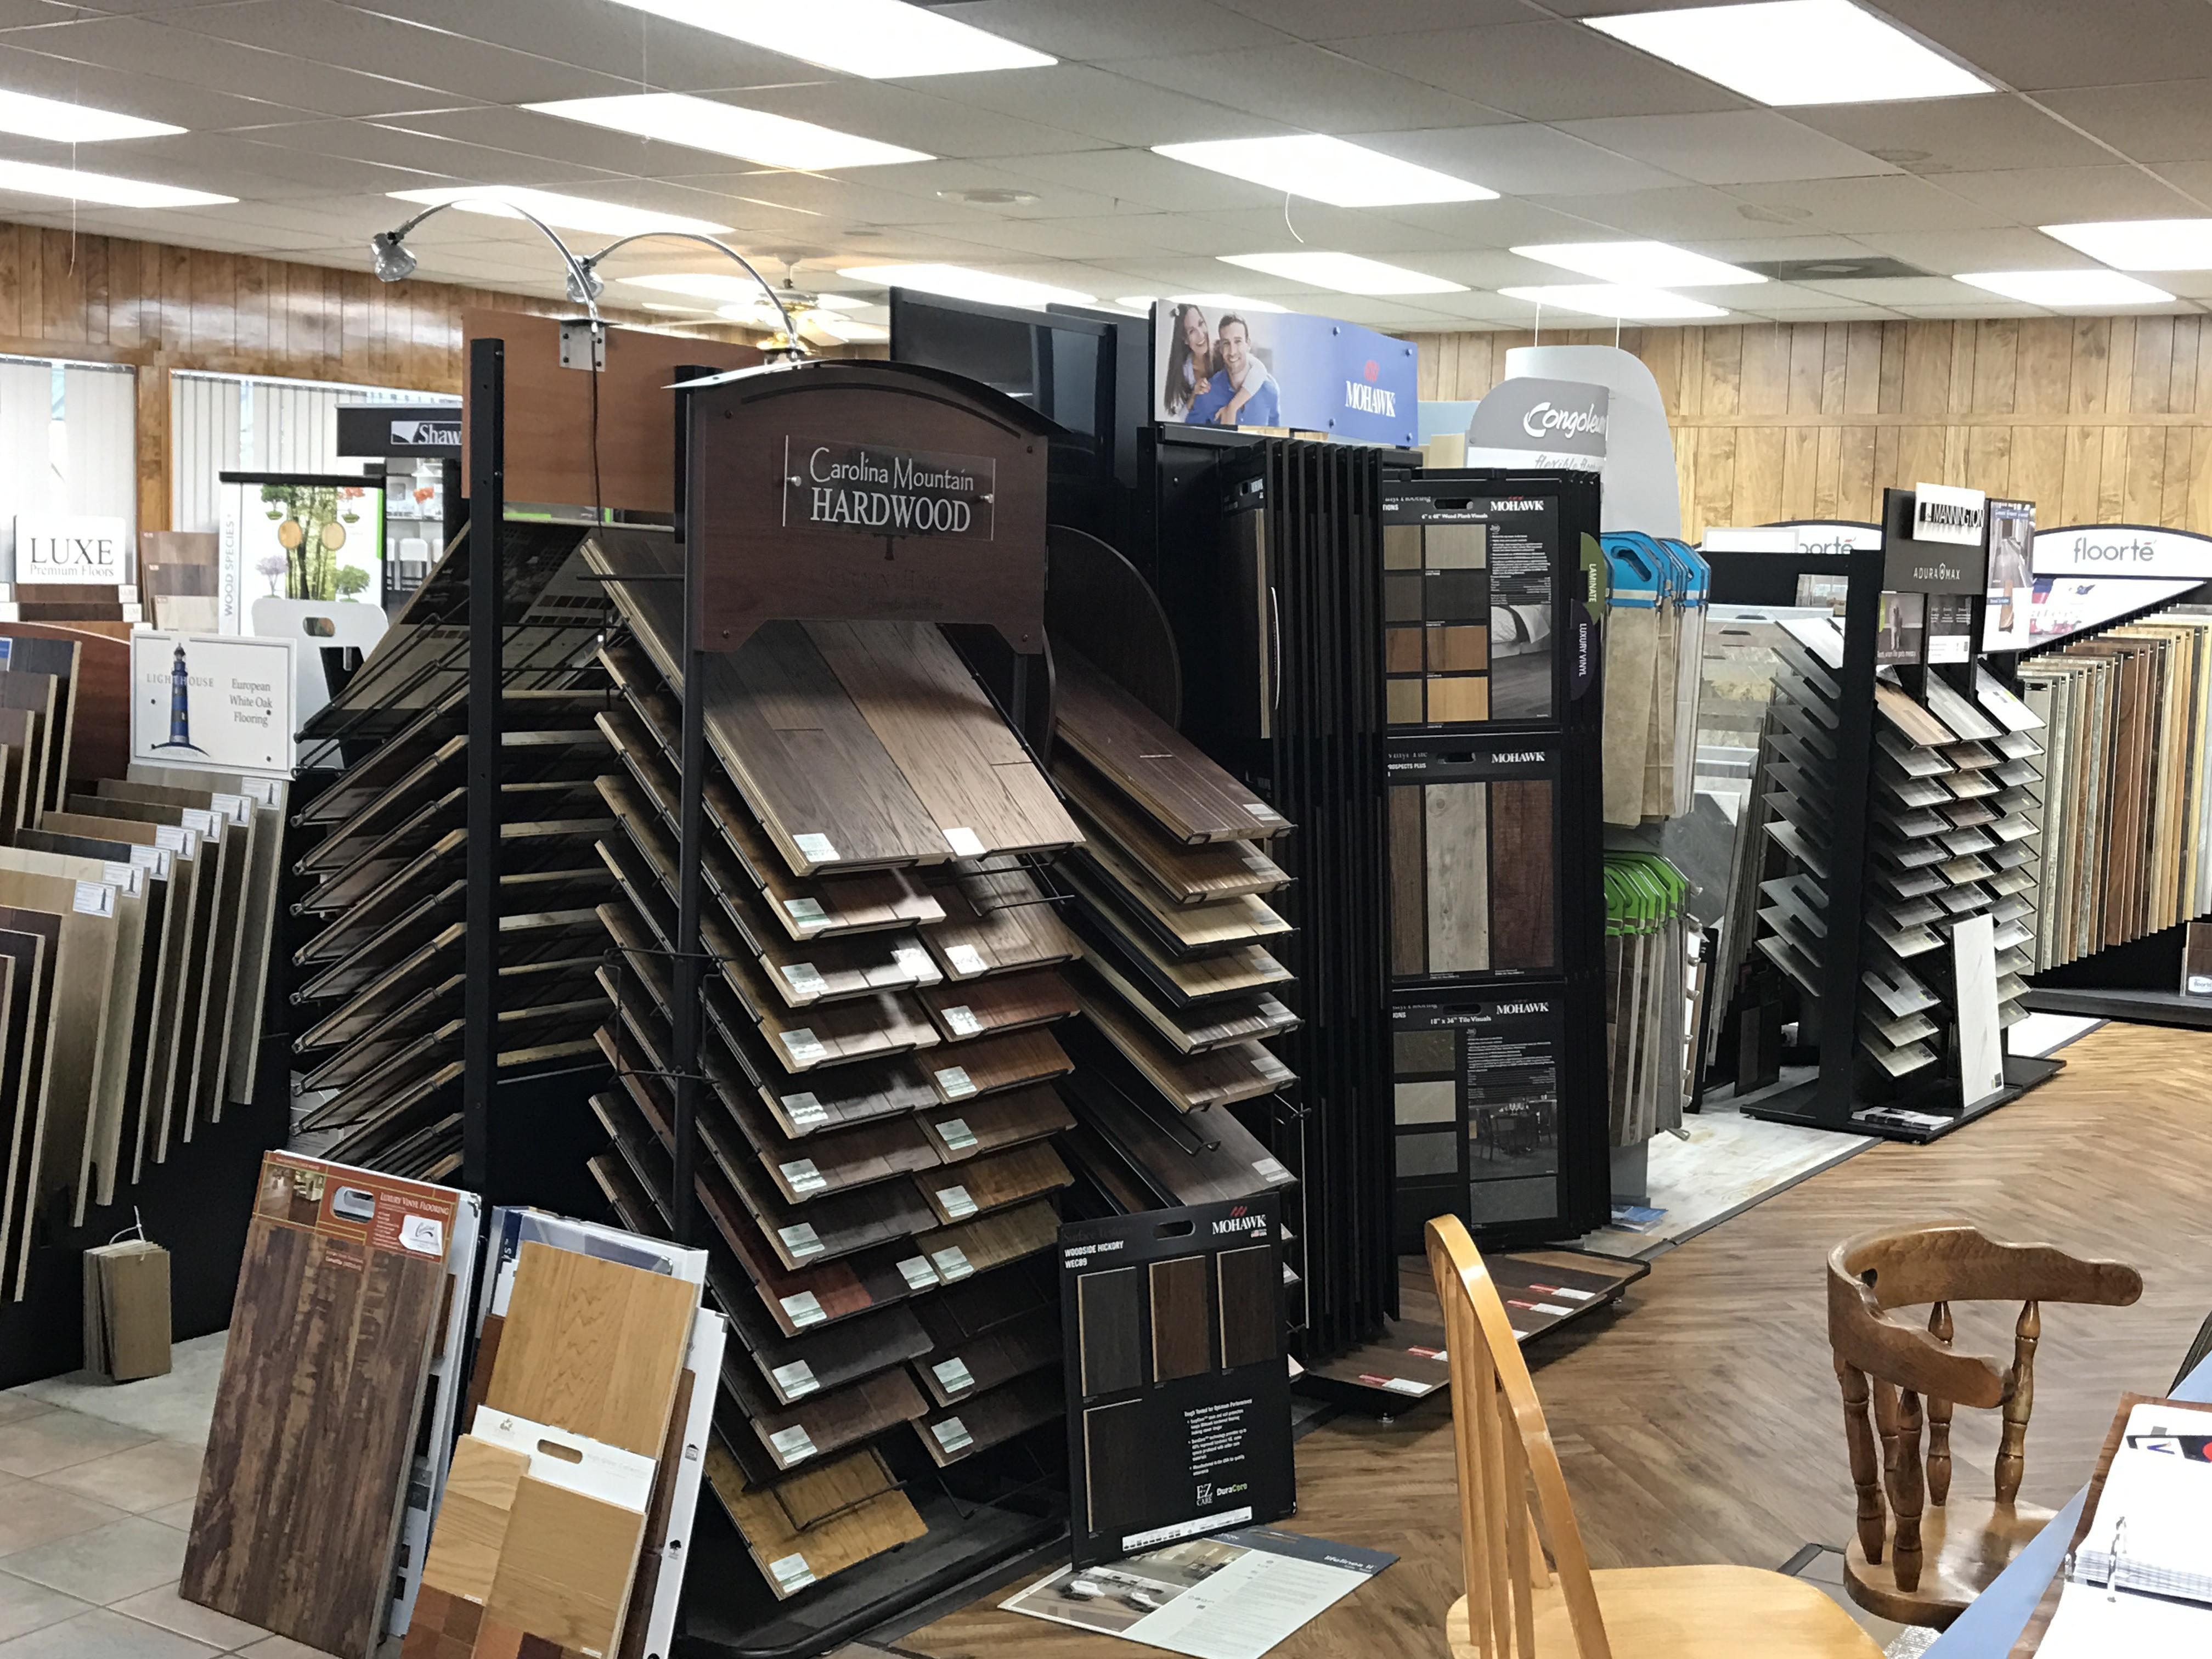 hardwood floor refinishing lexington sc of floor mart west inc for showroom hardwood